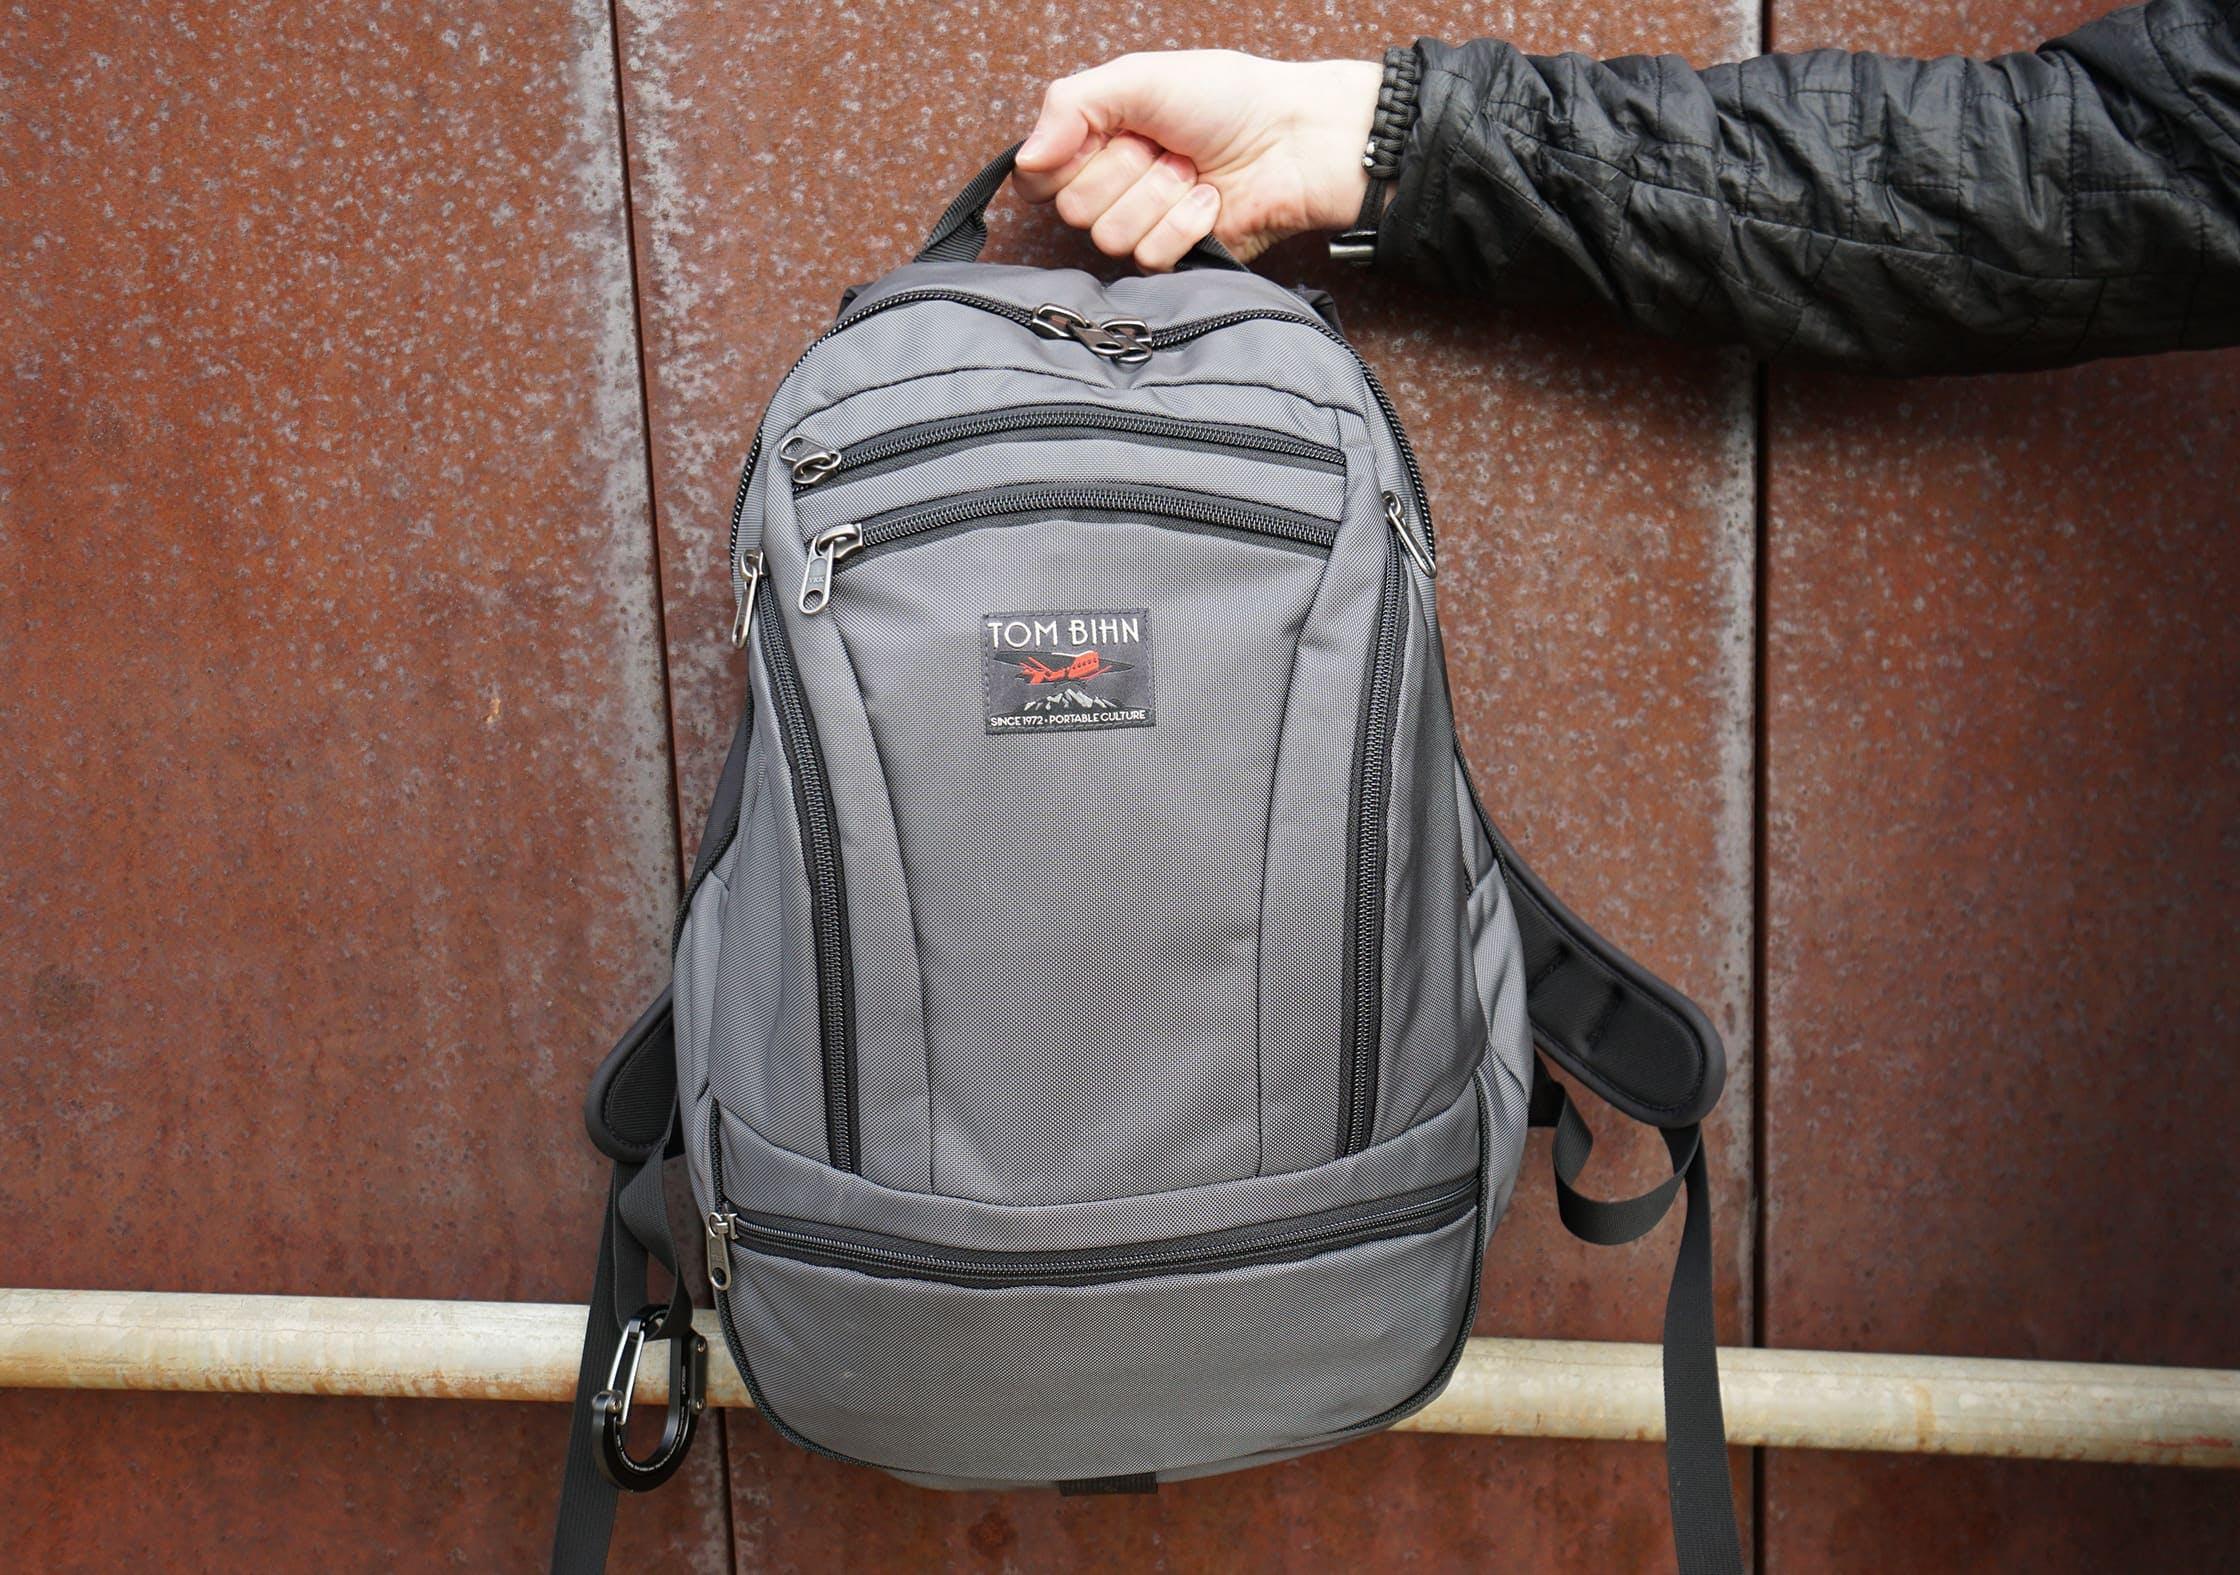 5a39ff5ea8 Tom Bihn Synapse 25 Travel Backpack